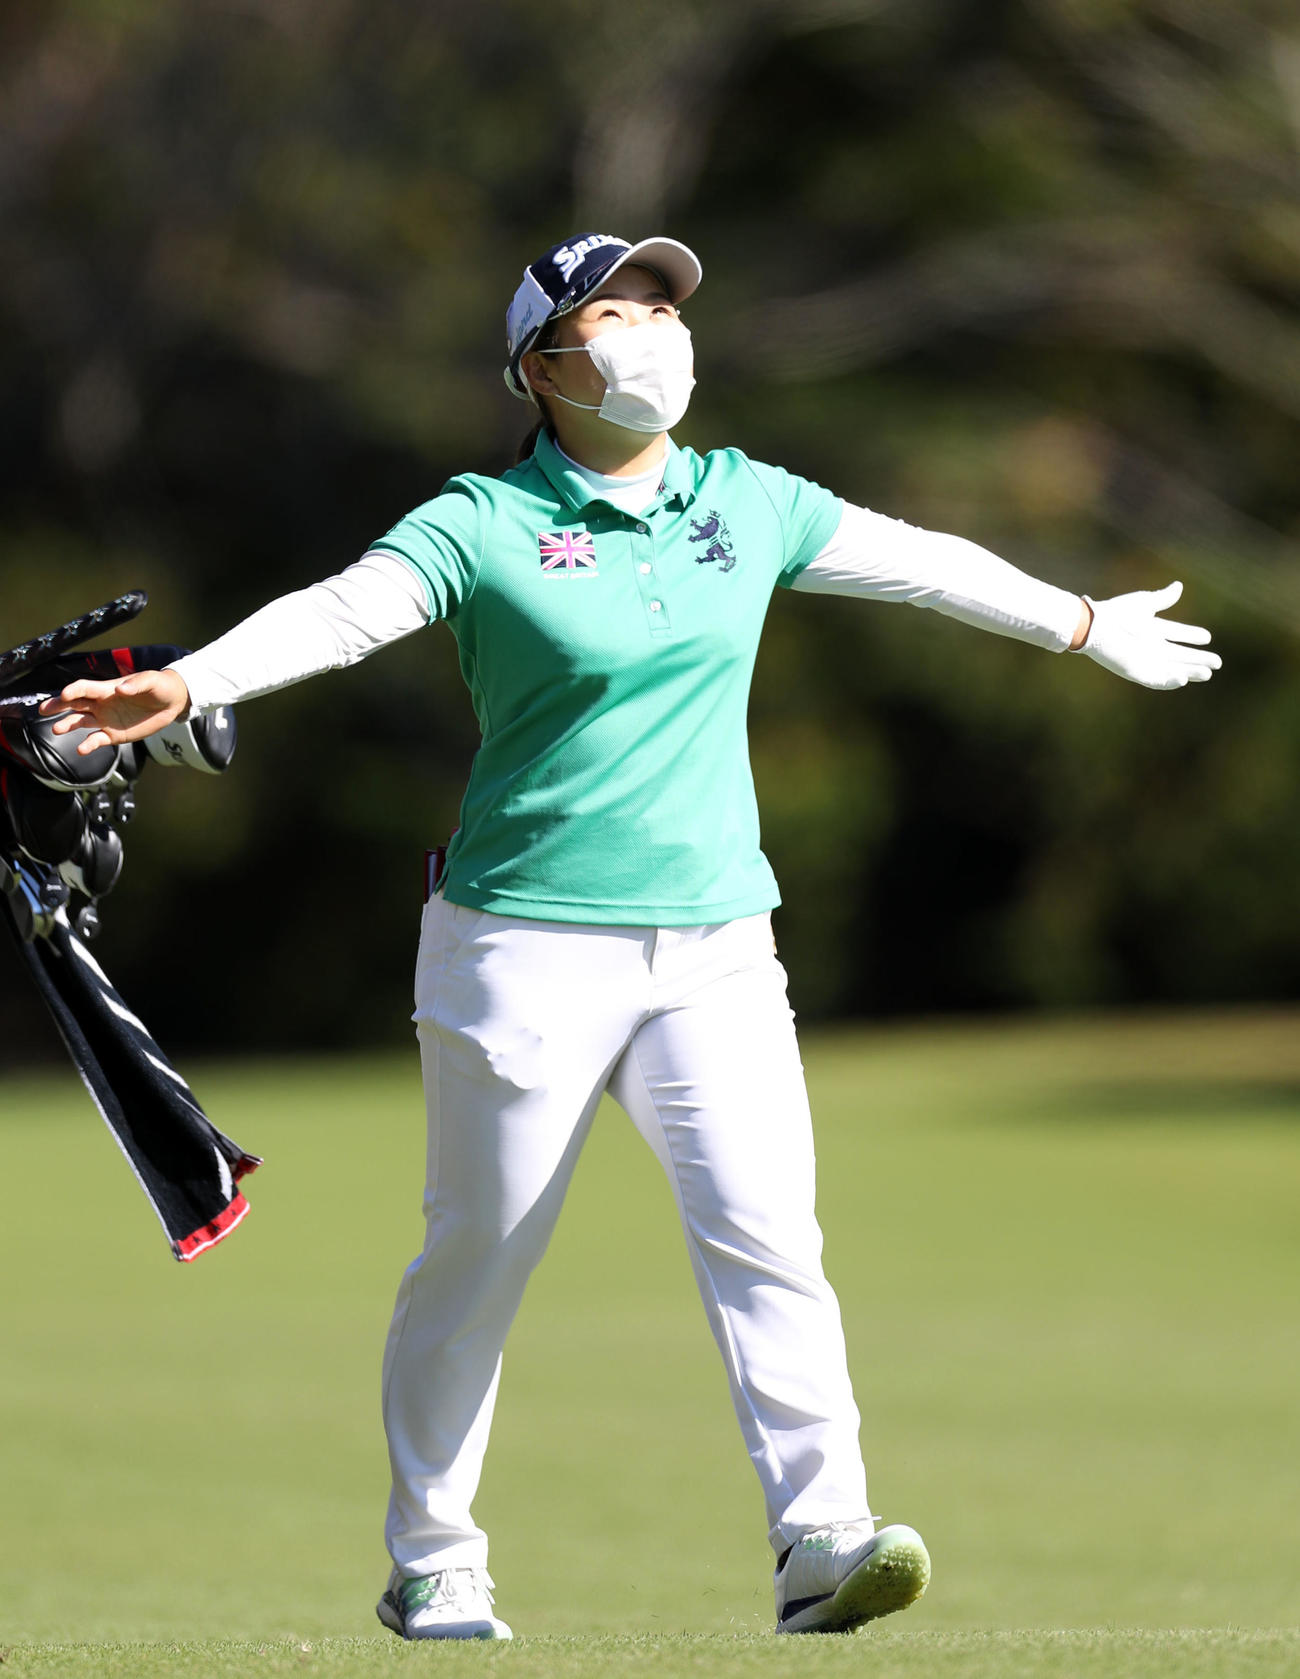 https://www.nikkansports.com/sports/golf/news/img/202011040000186-w1300_4.jpg